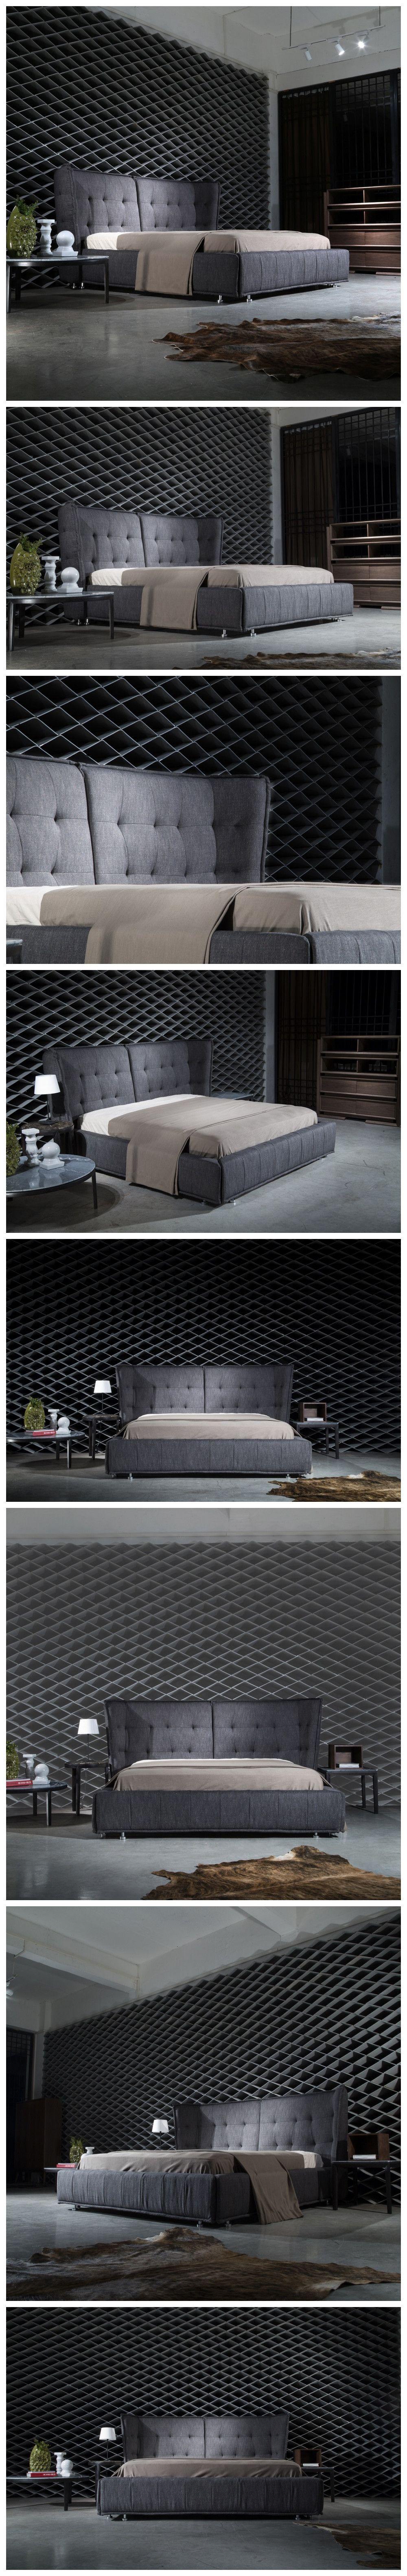 Comfortable modern bedroom furniture wooden bed furniture queen size